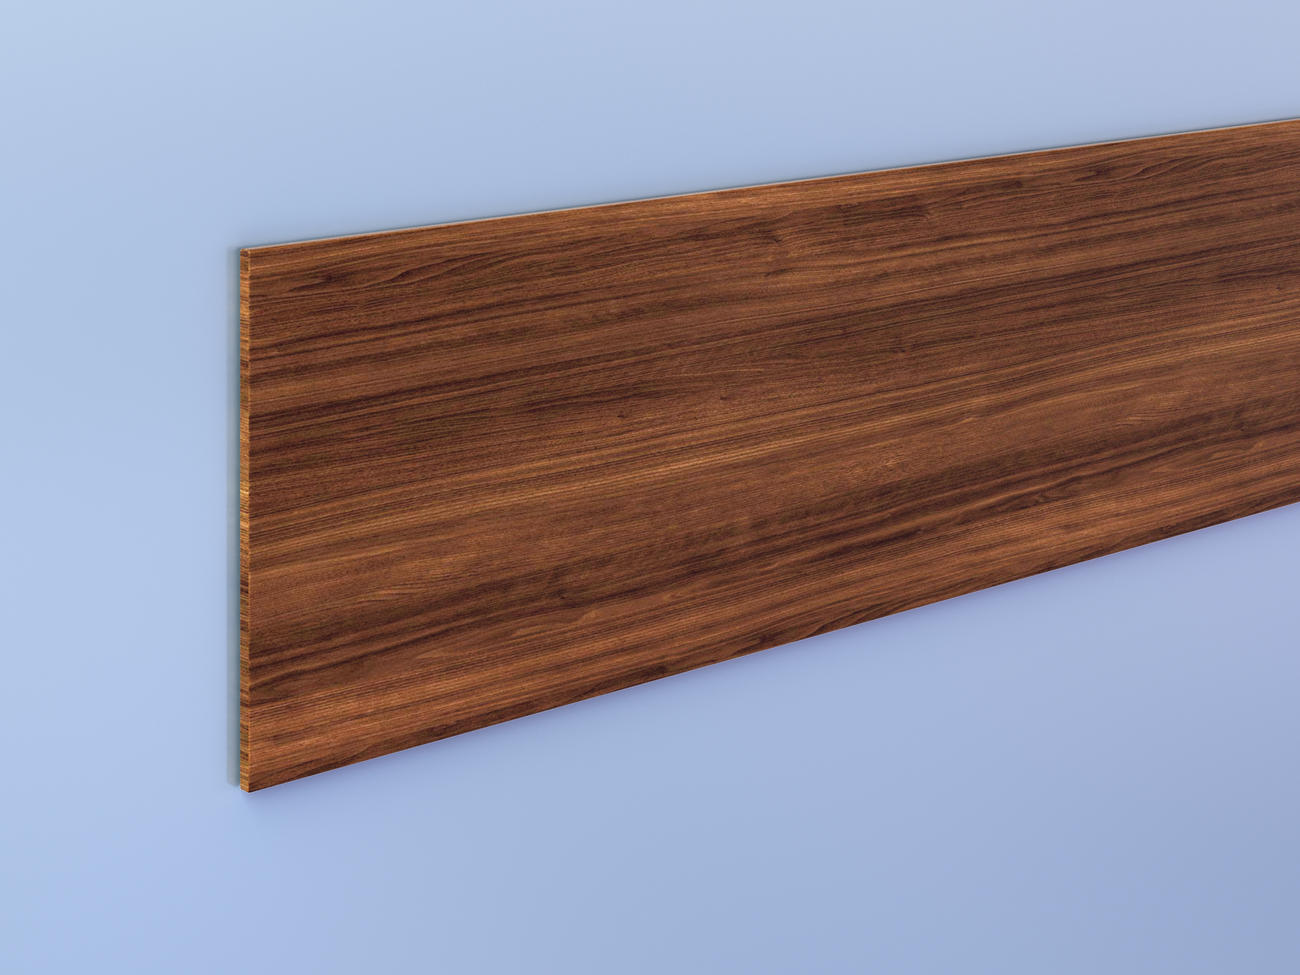 CRDA-64 Decorative Aluminum Rub Rail